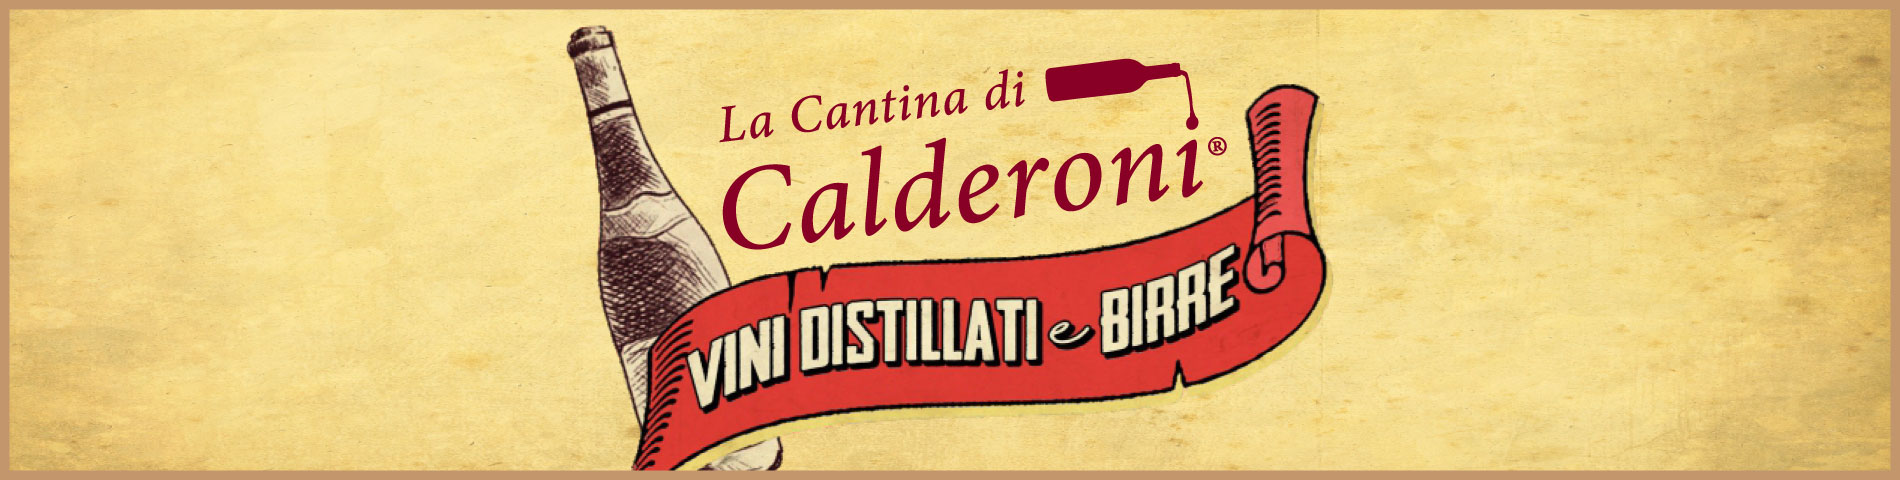 CALDERONI1